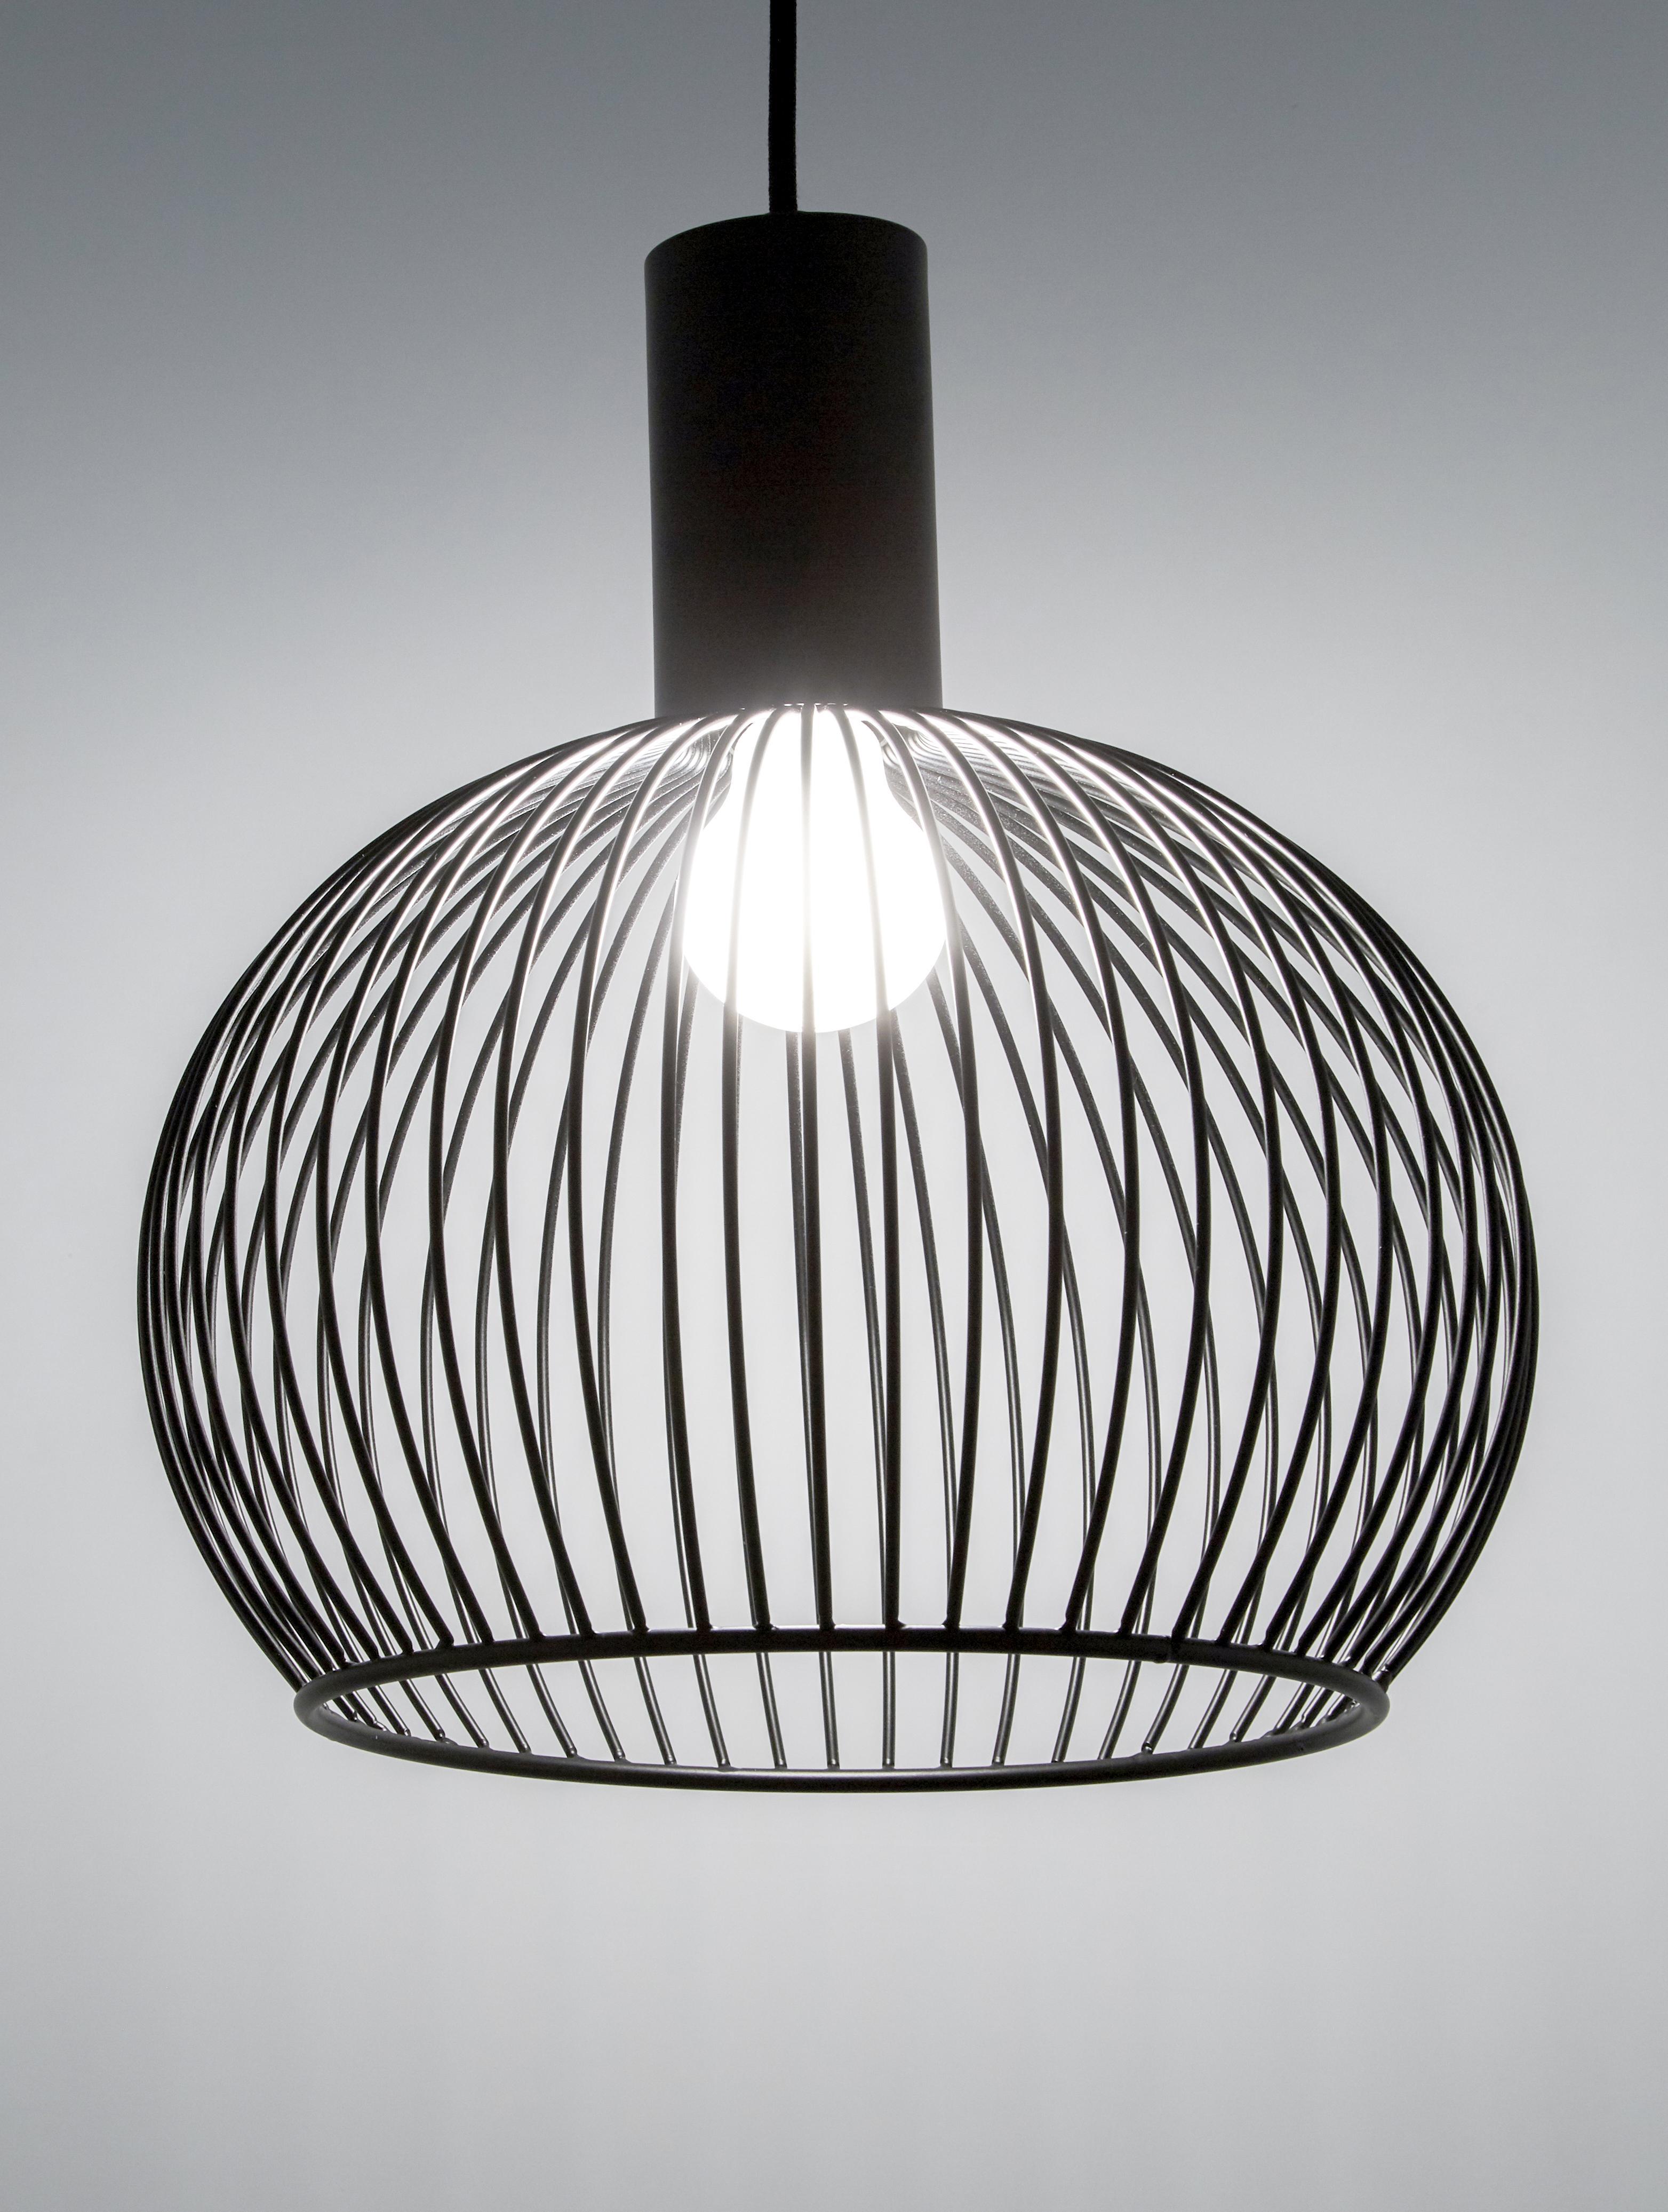 Design hanglamp Aver, Lampenkap: gelakt staal, Baldakijn: kunststof, Zwart, Ø 40 x H 45 cm